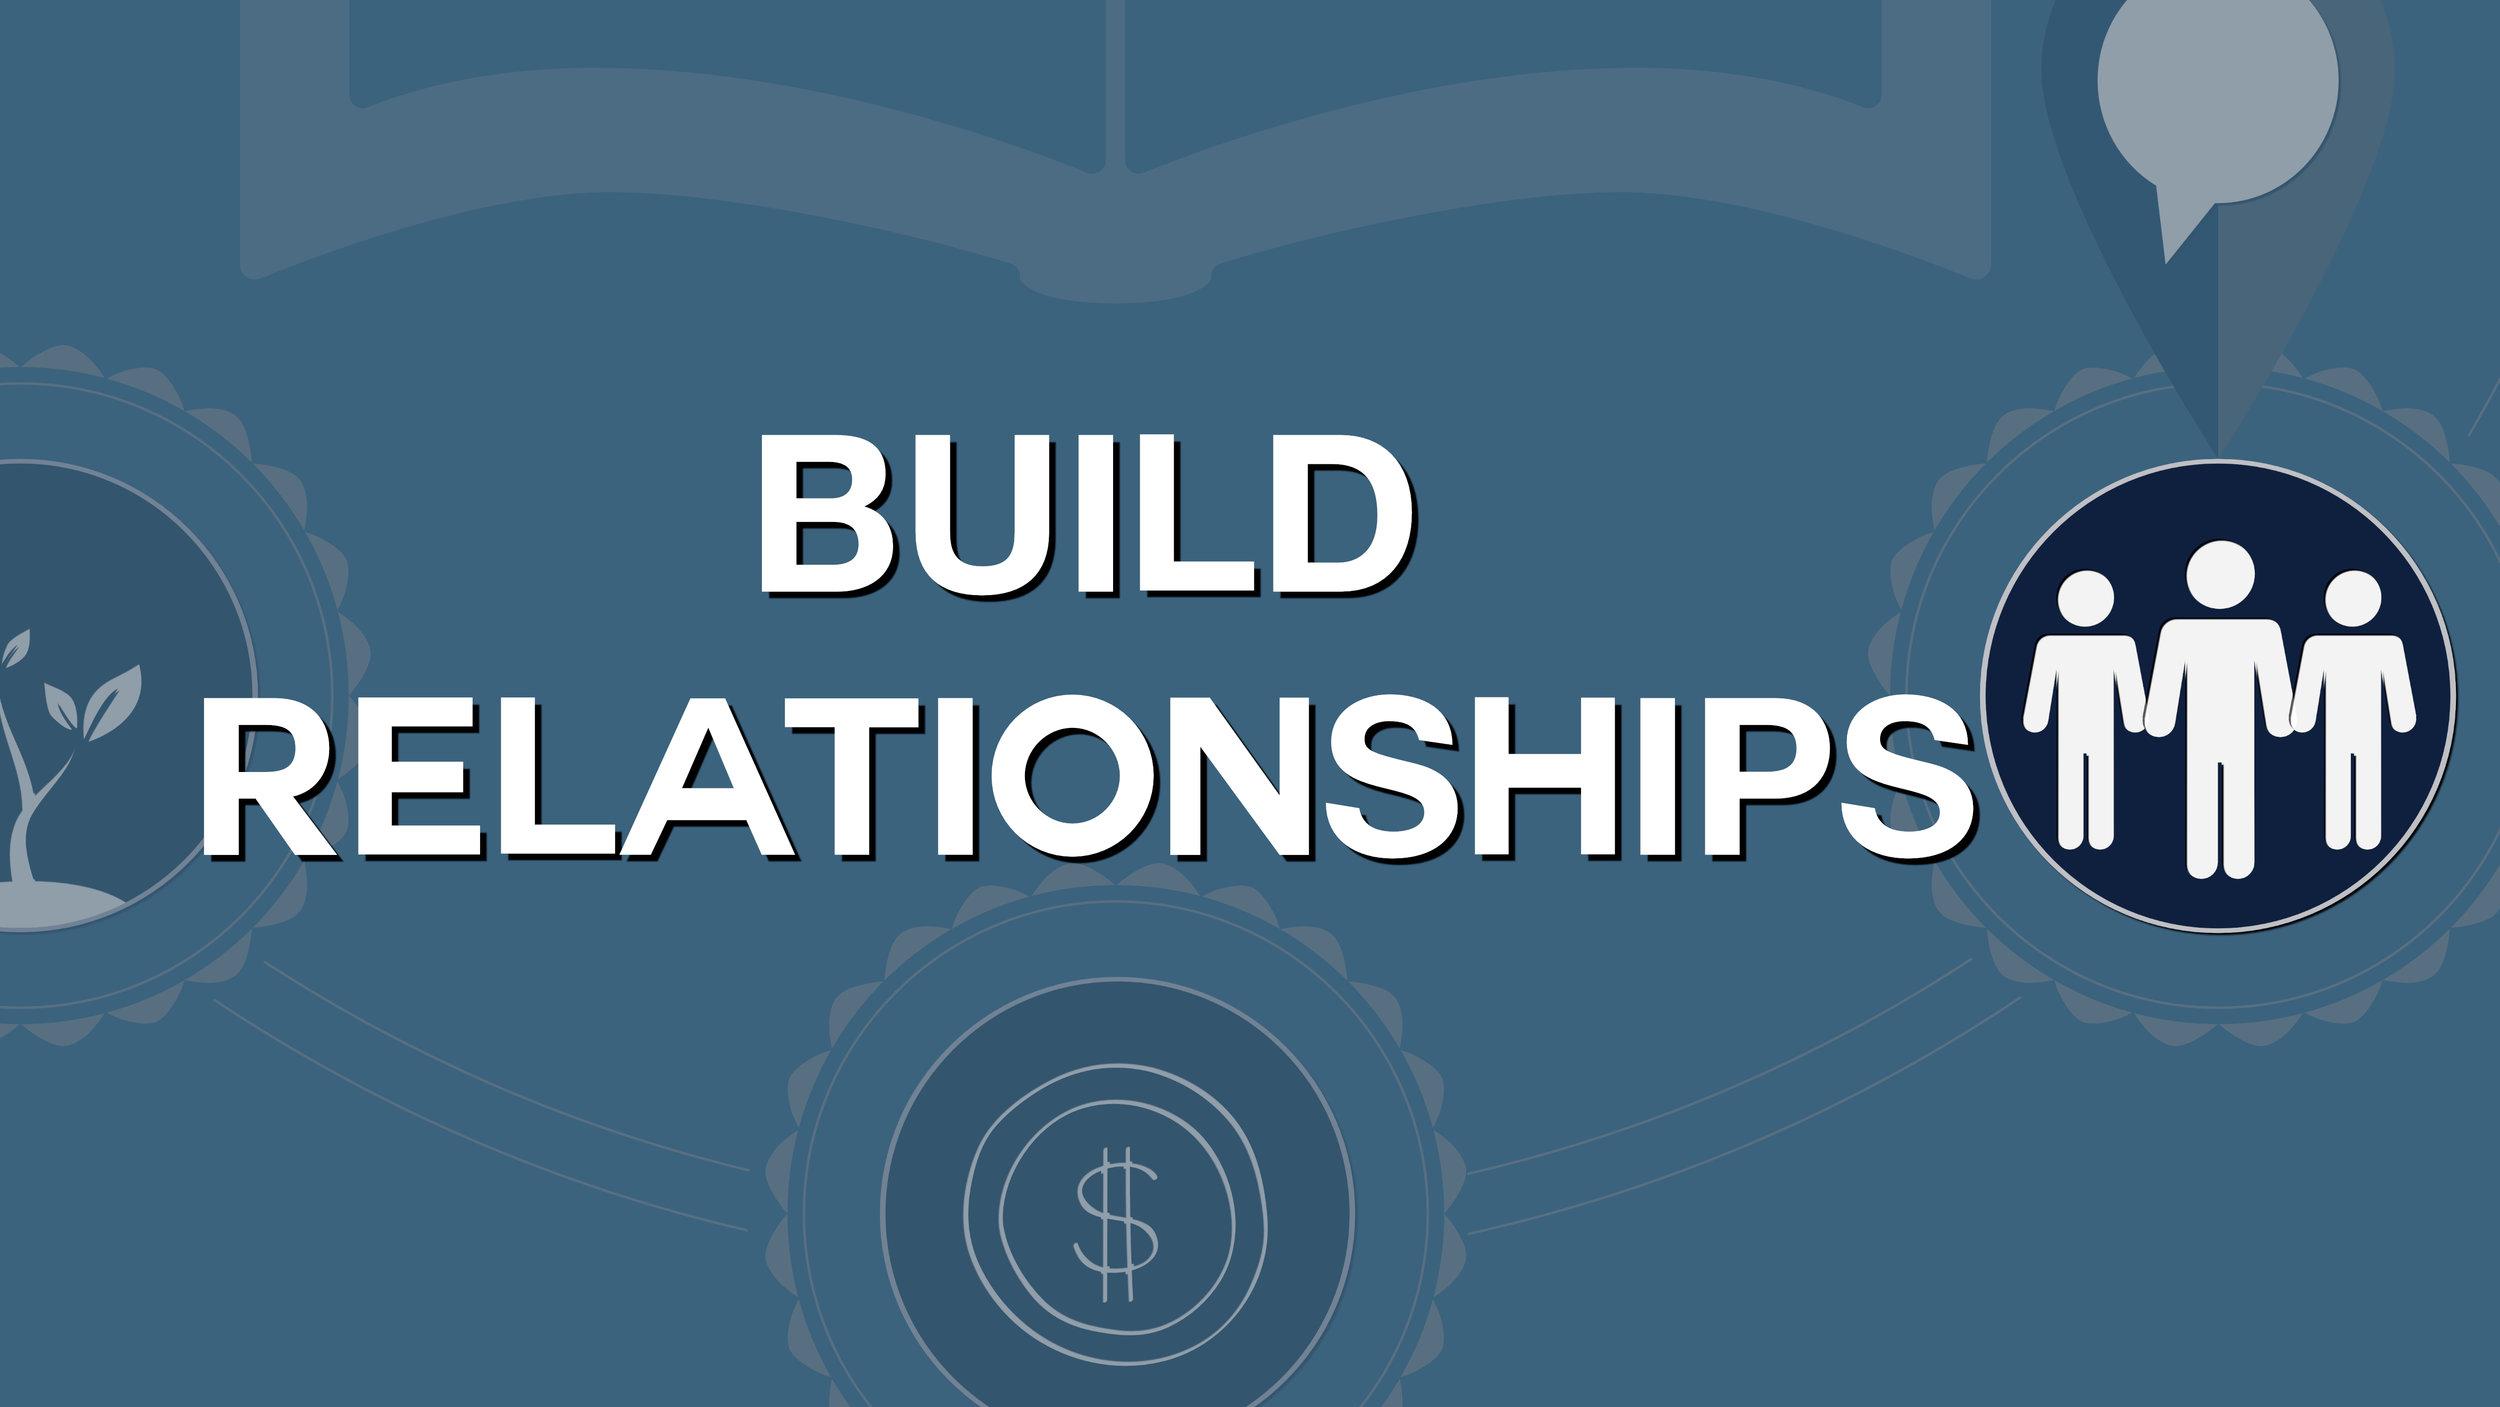 BUILD RELATIONSHIPS TITLE SLIDE - BIBLICAL FRAMEWORK - GETTING INTO THE WORD IN 2018 - BLUE.jpg